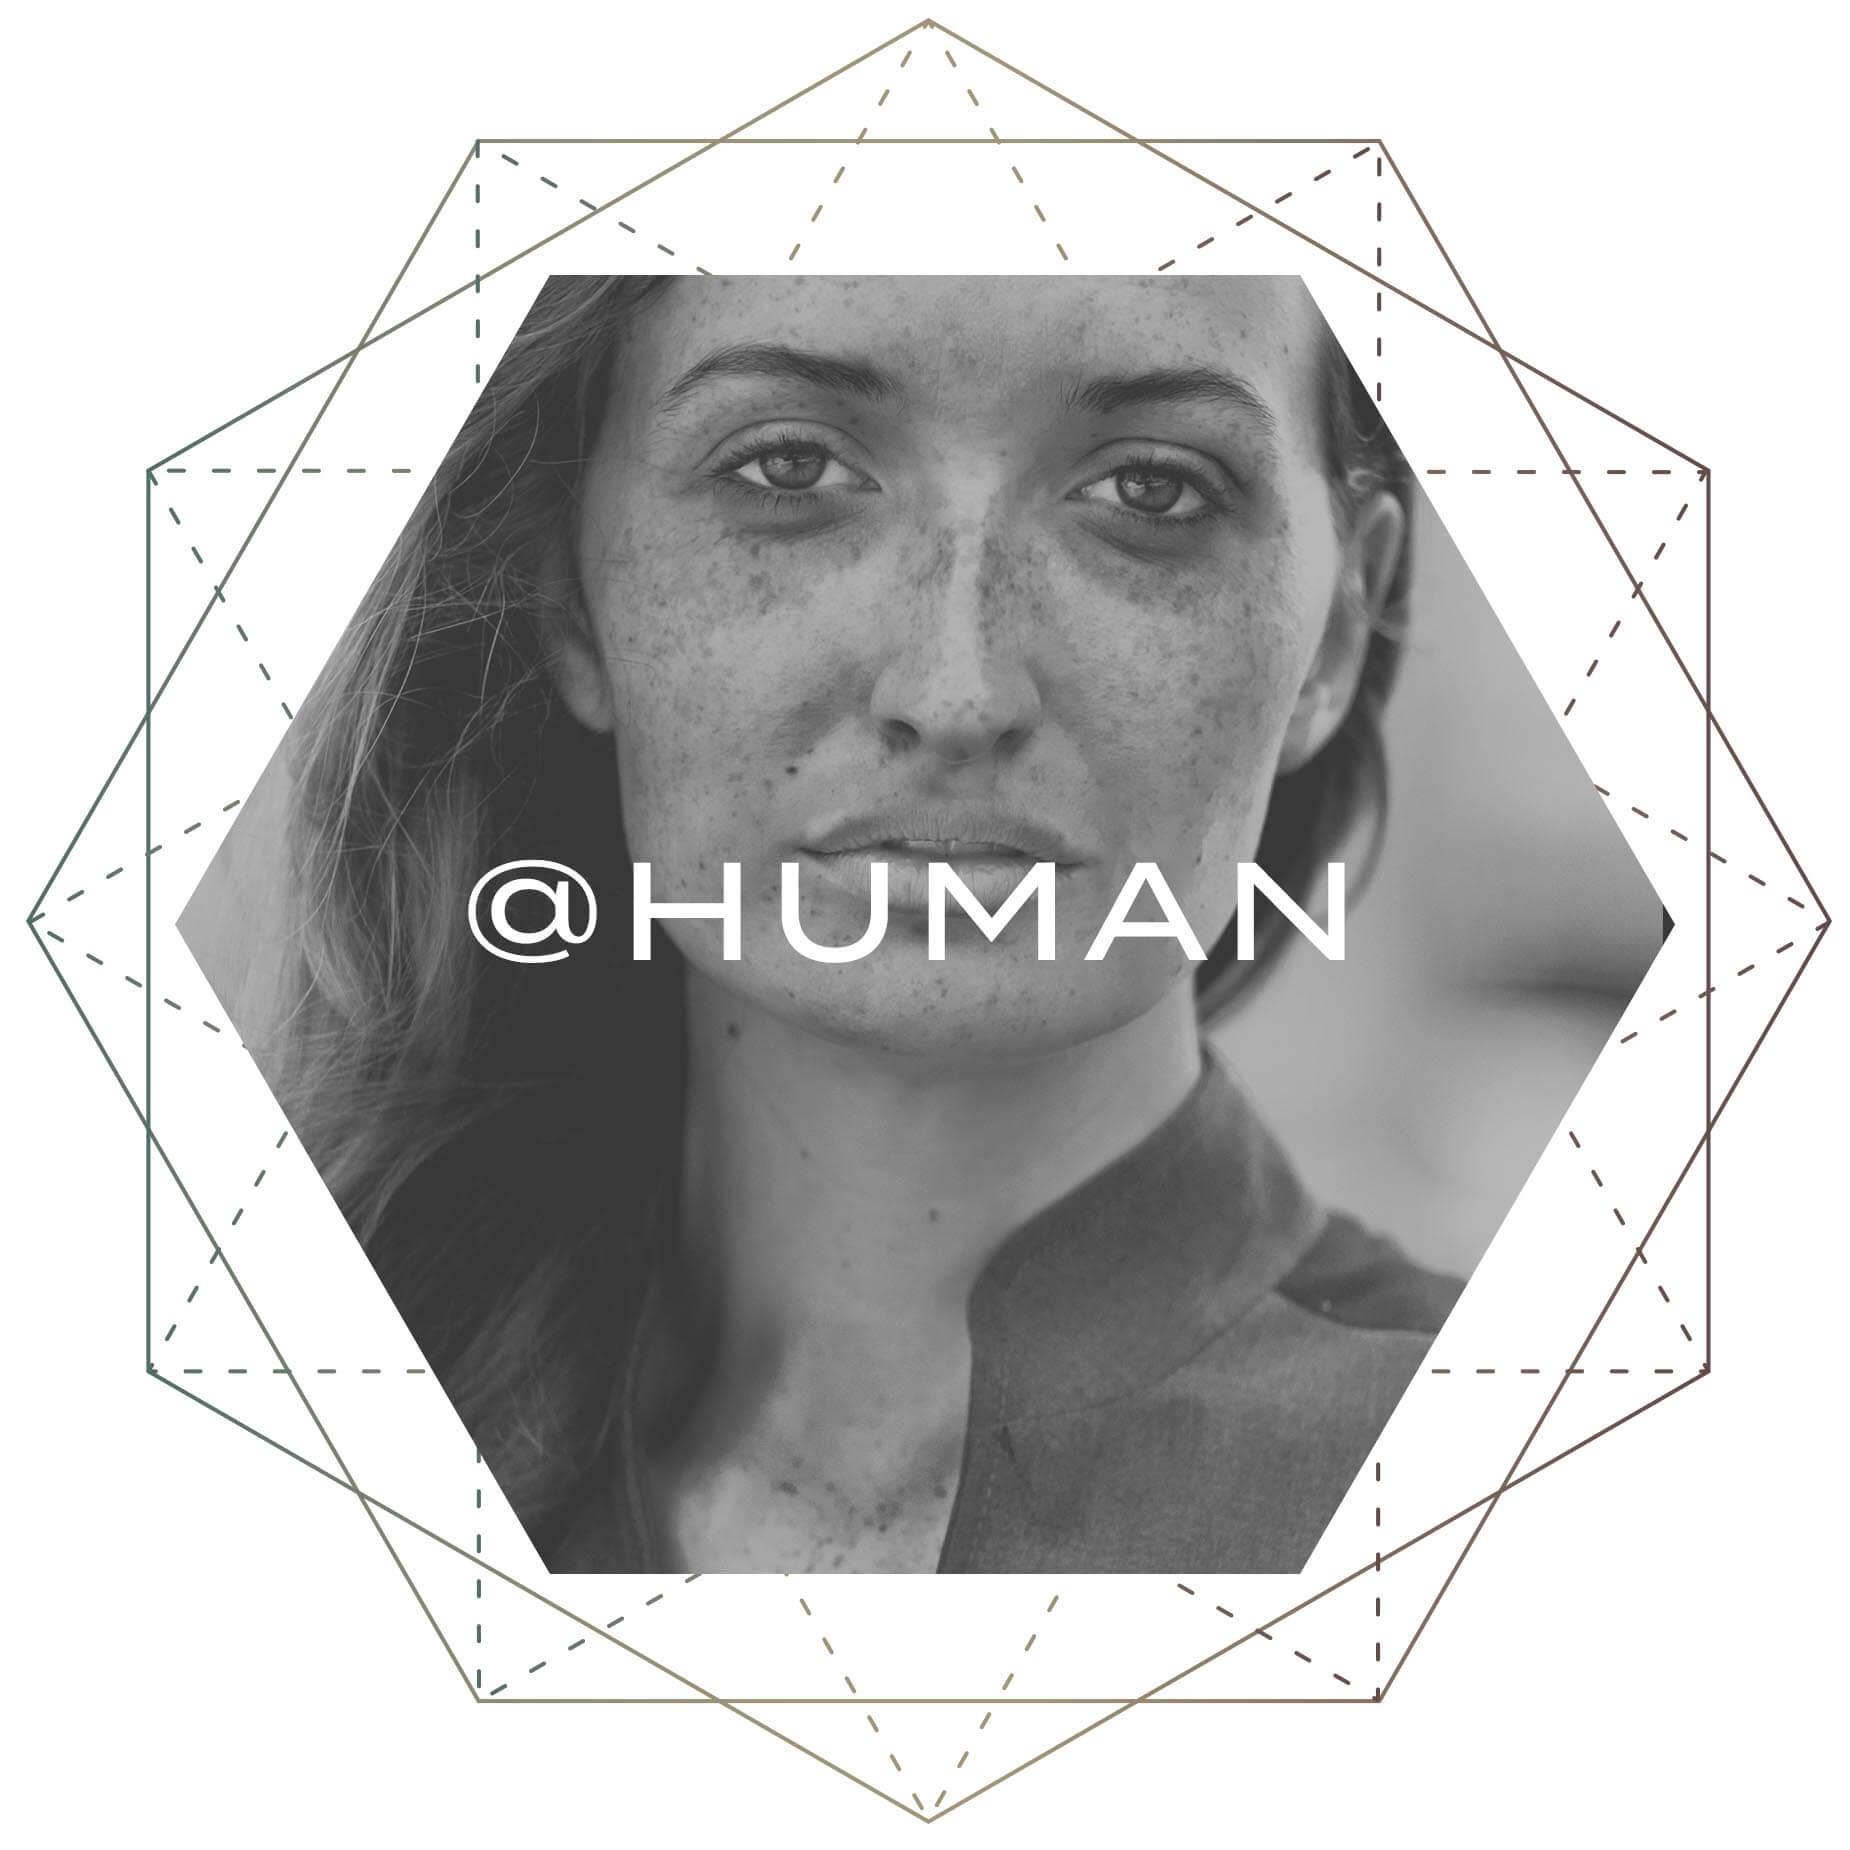 Humans-3-1